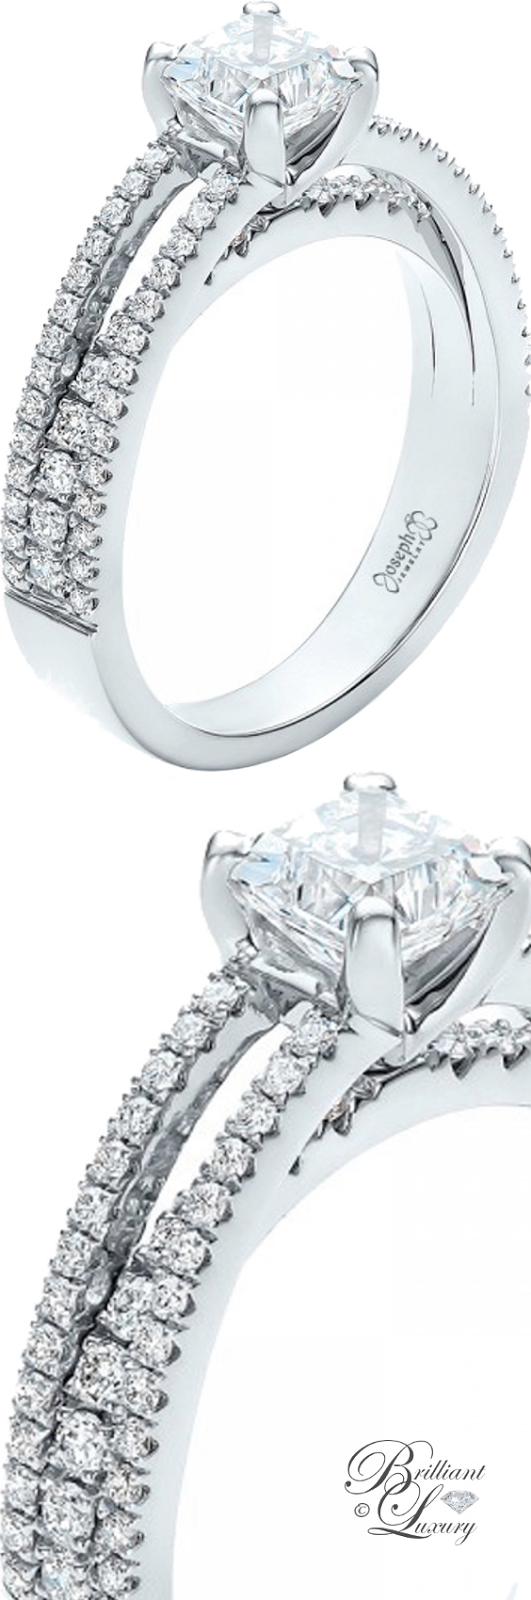 Brilliant Luxury ♦ Custom Split Shank Diamond Engagement Ring